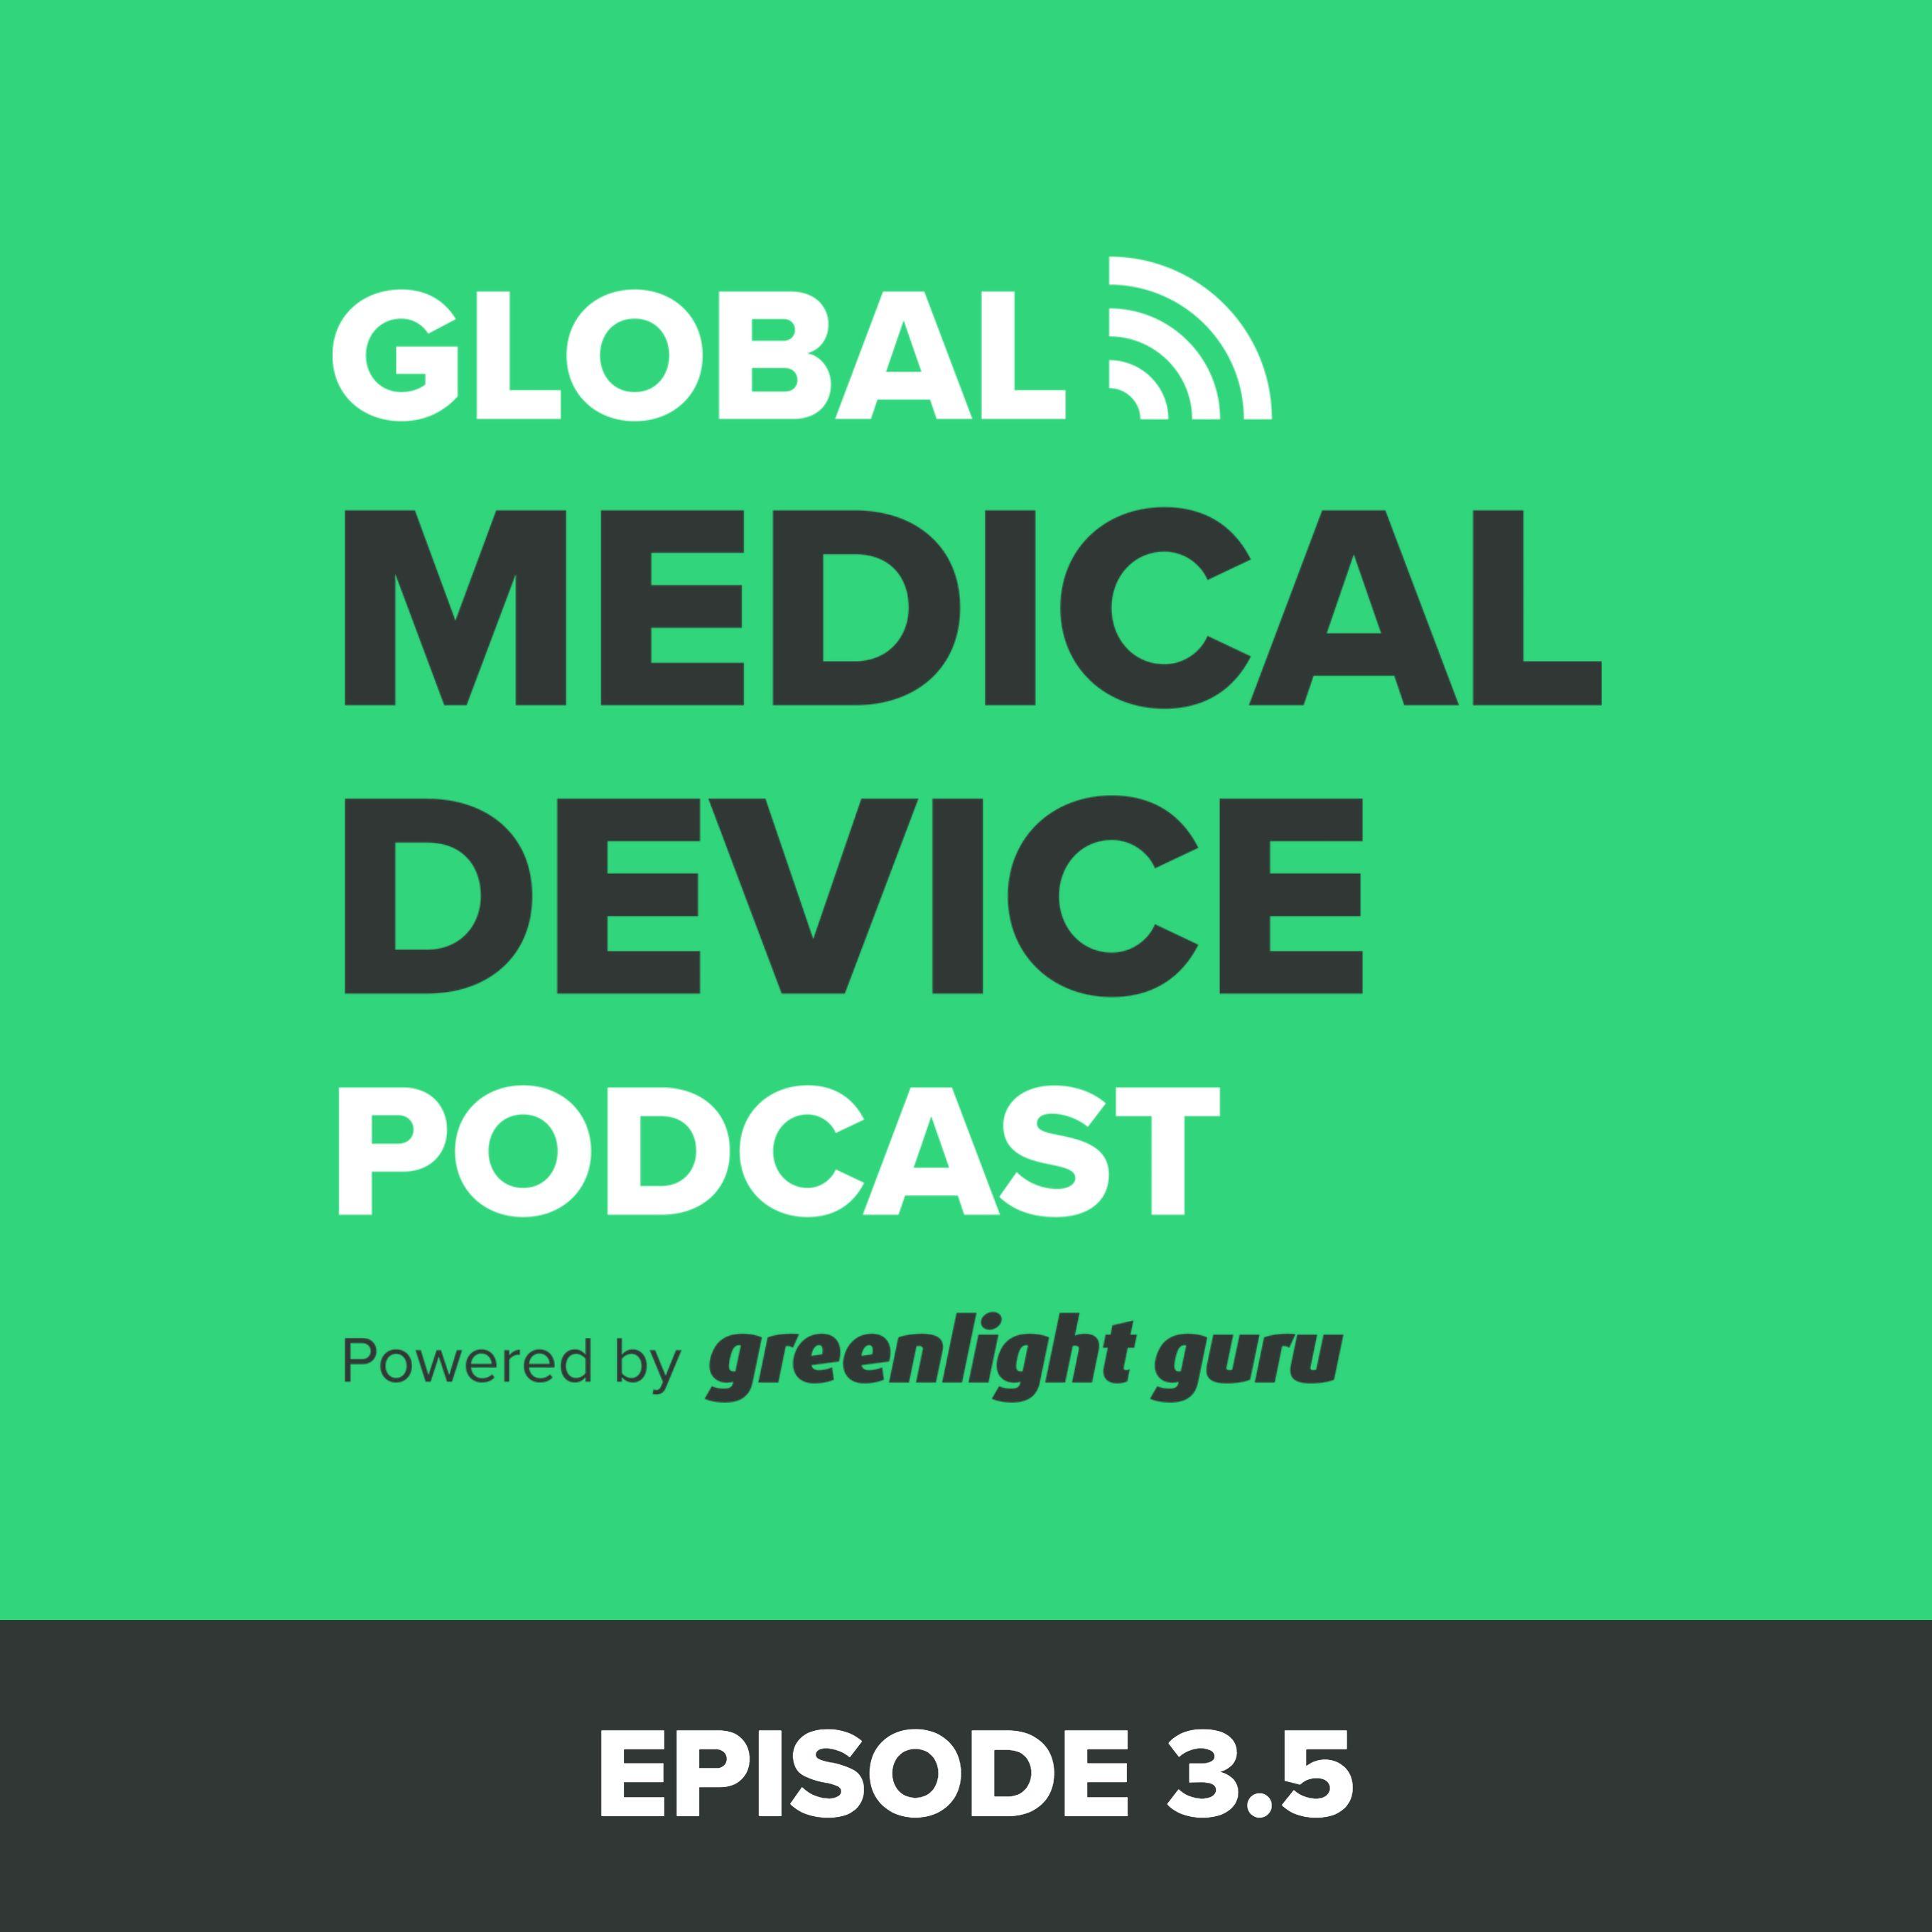 How to Improve Your Medical Device Design Reviews Bonus Episode